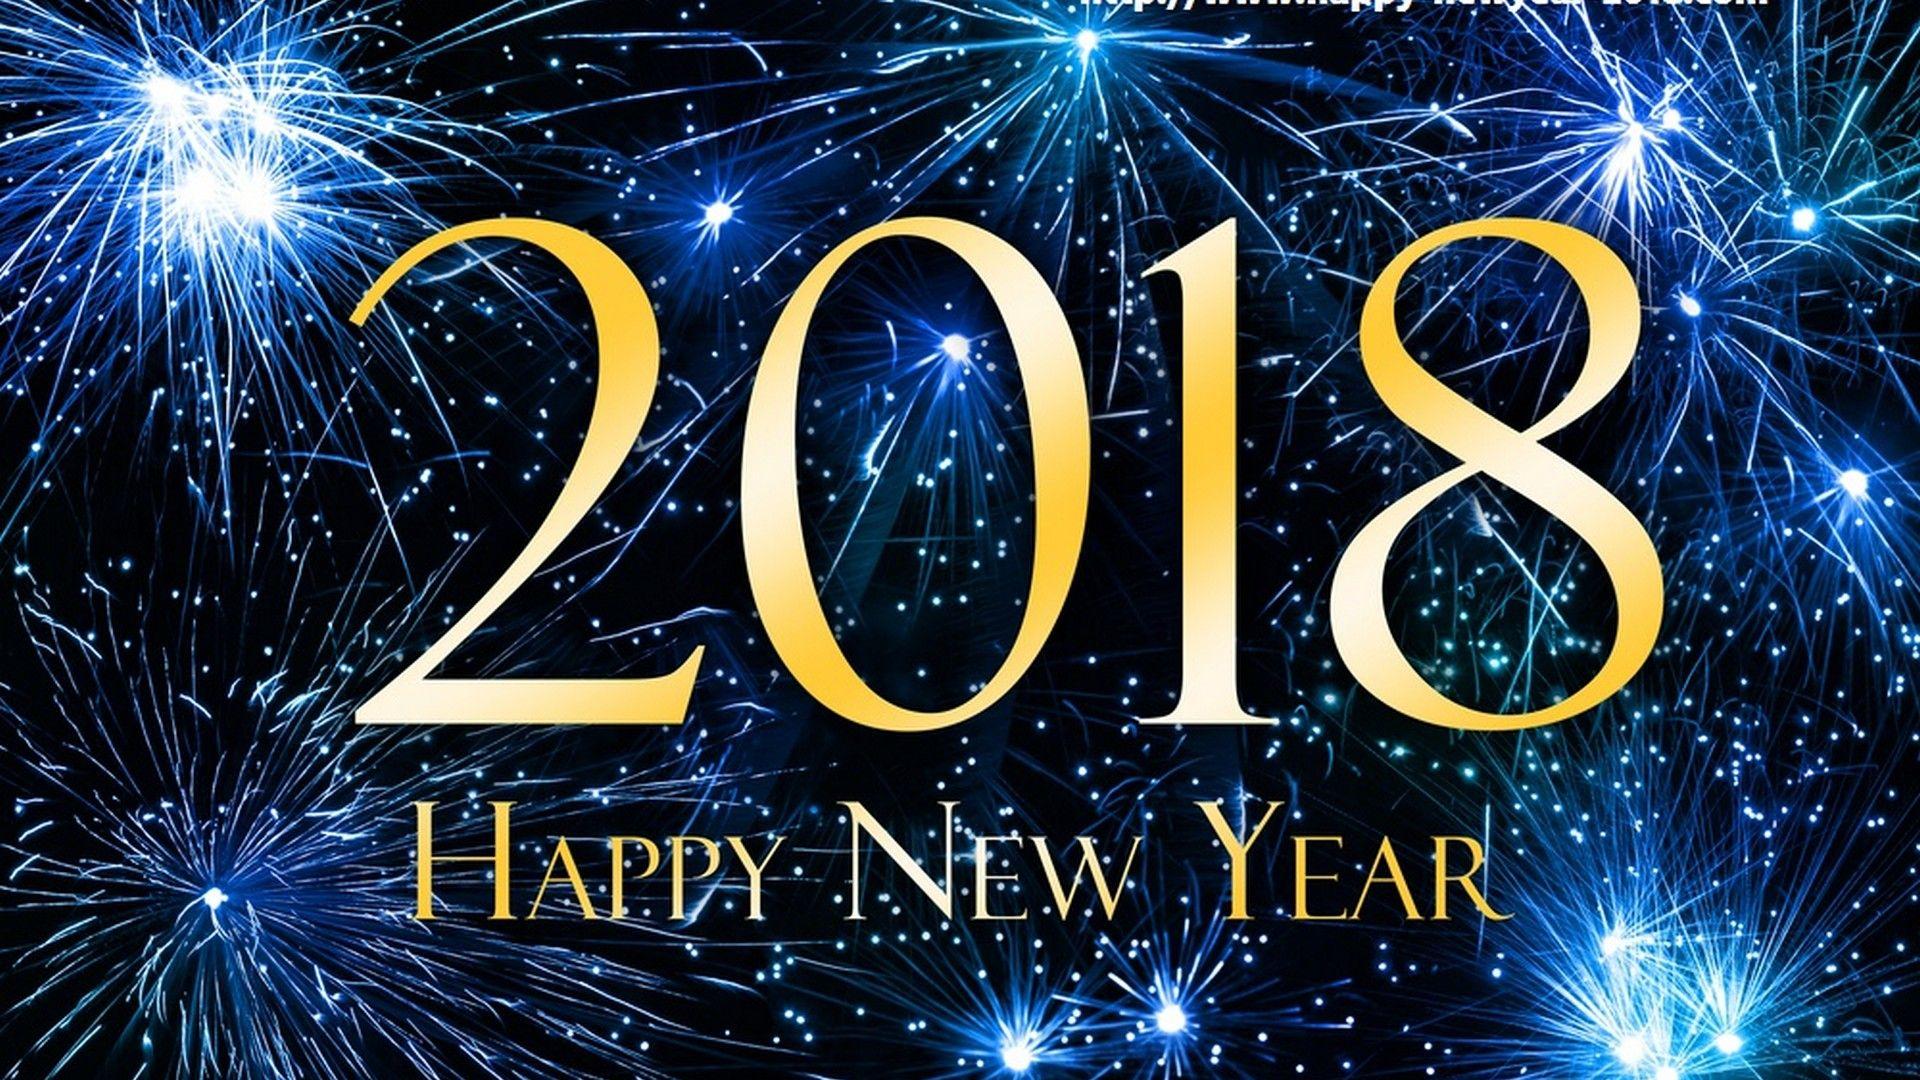 2018 Happy New Year Wallpaper 2018 Wallpapers Hd Wallpaper